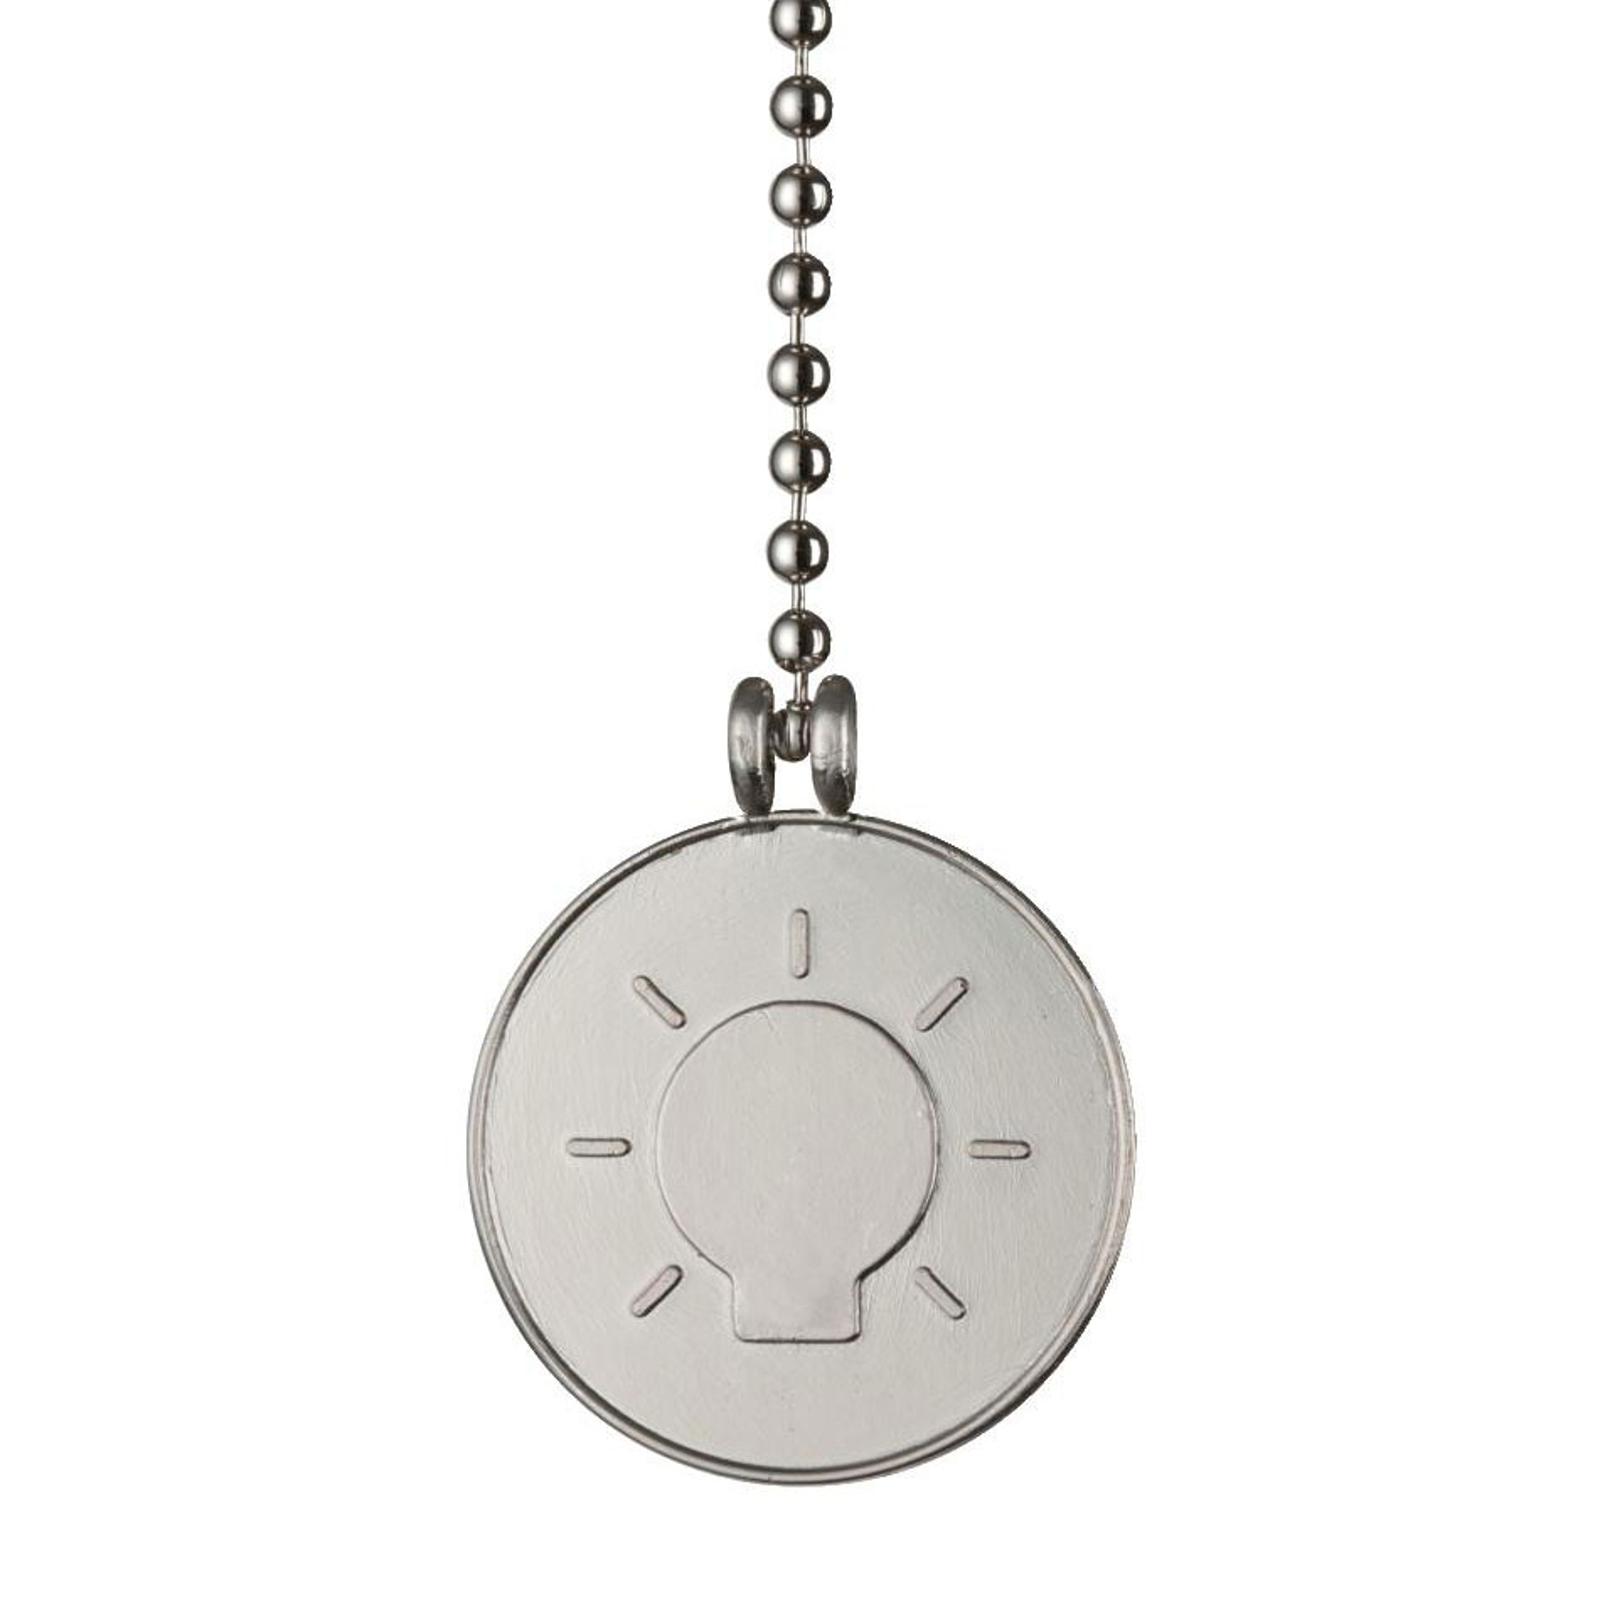 Westinghouse glødepære medaljon trækkæde nikkel